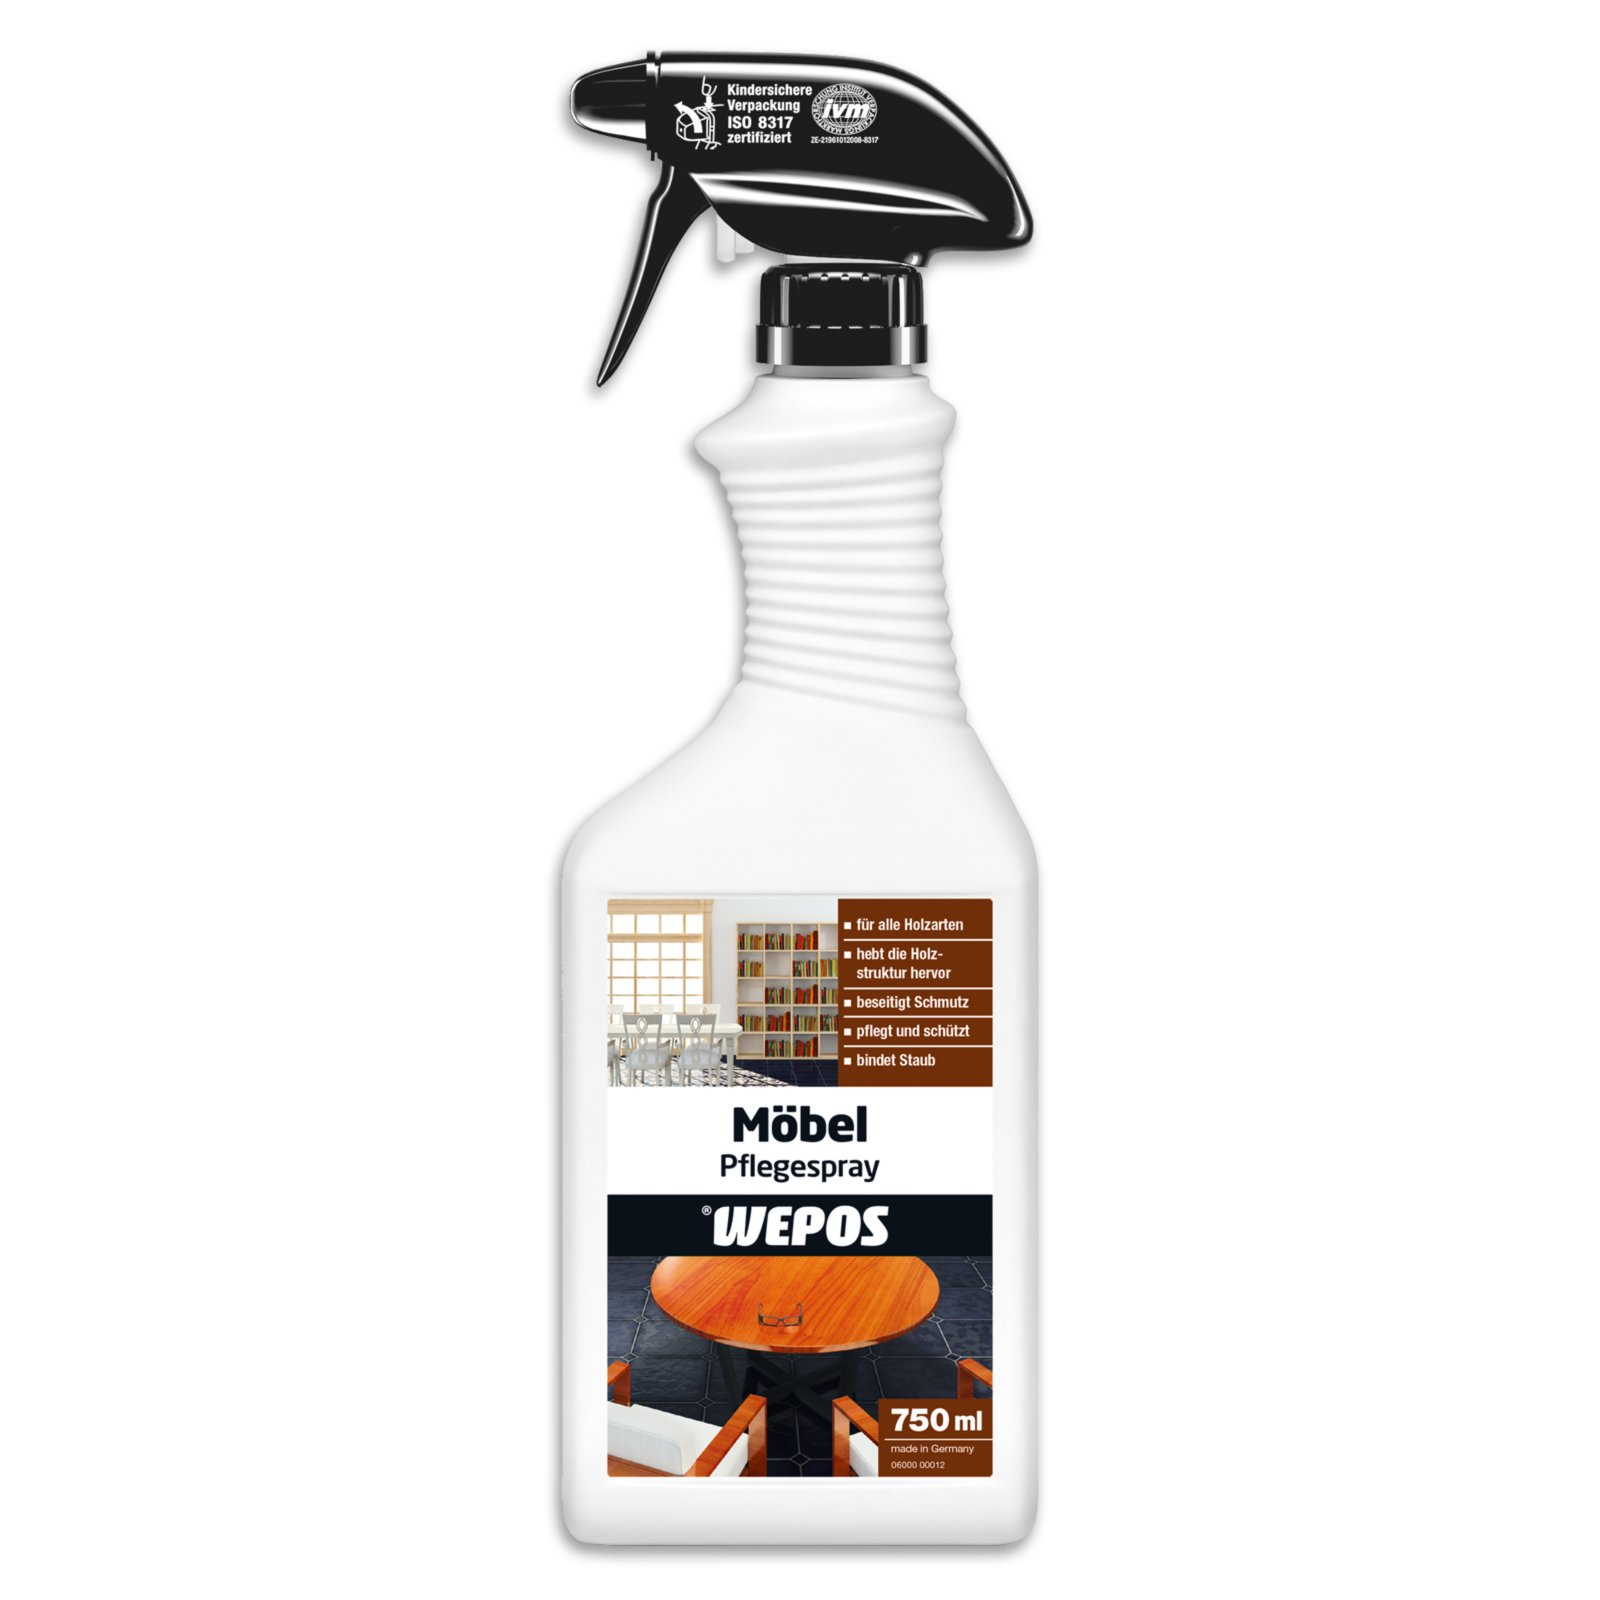 Möbel Pflegespray Wepos - 750 ml